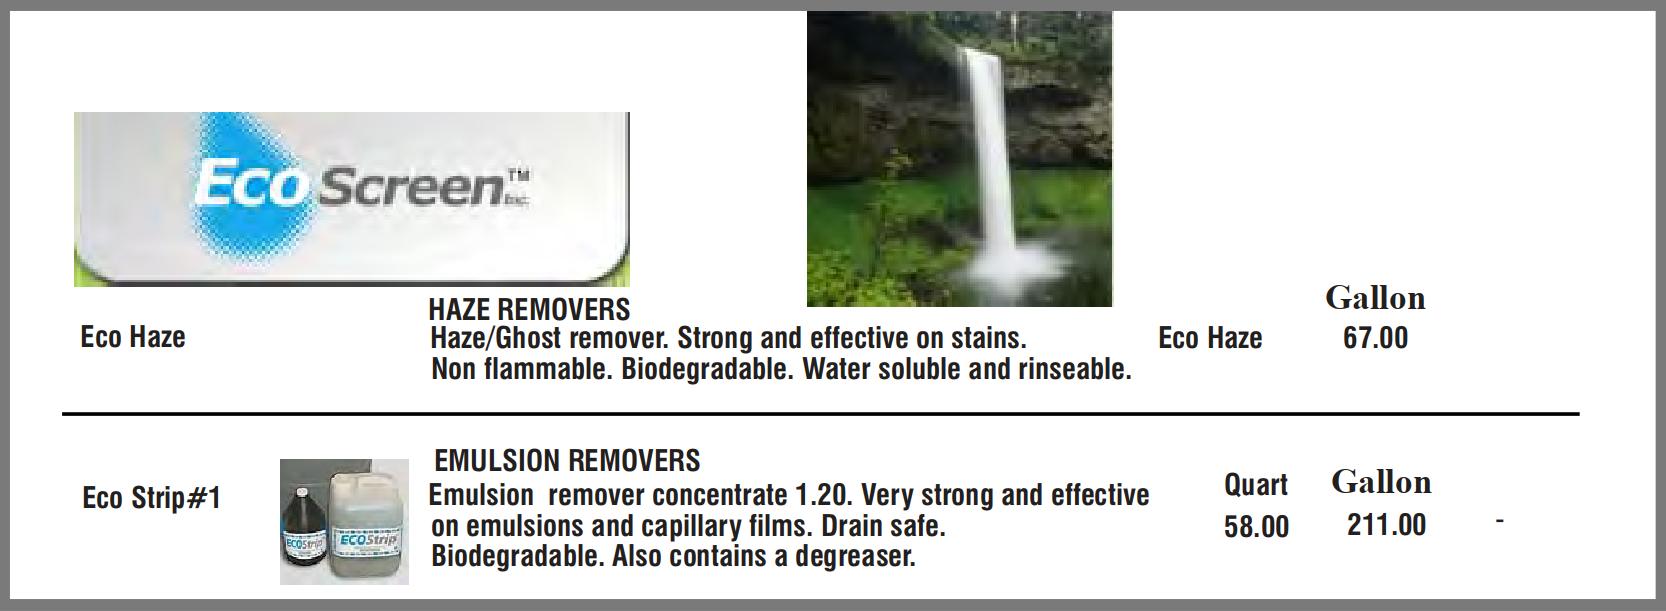 emulsion remover 3 1 - Screen Emulsion and Stencil Removers